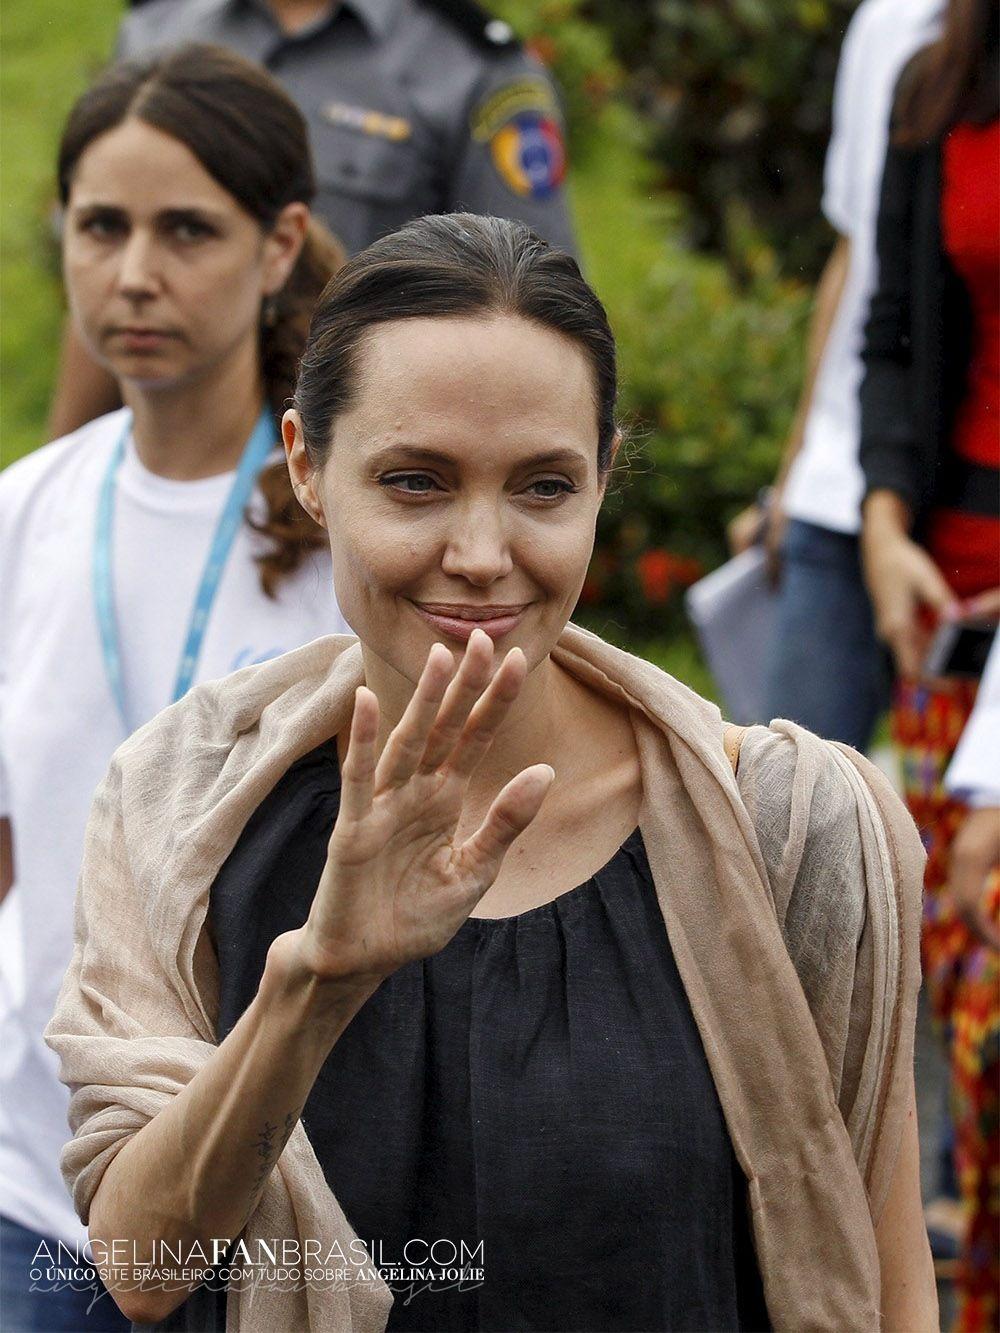 Джоли анджелина болеет последние фото